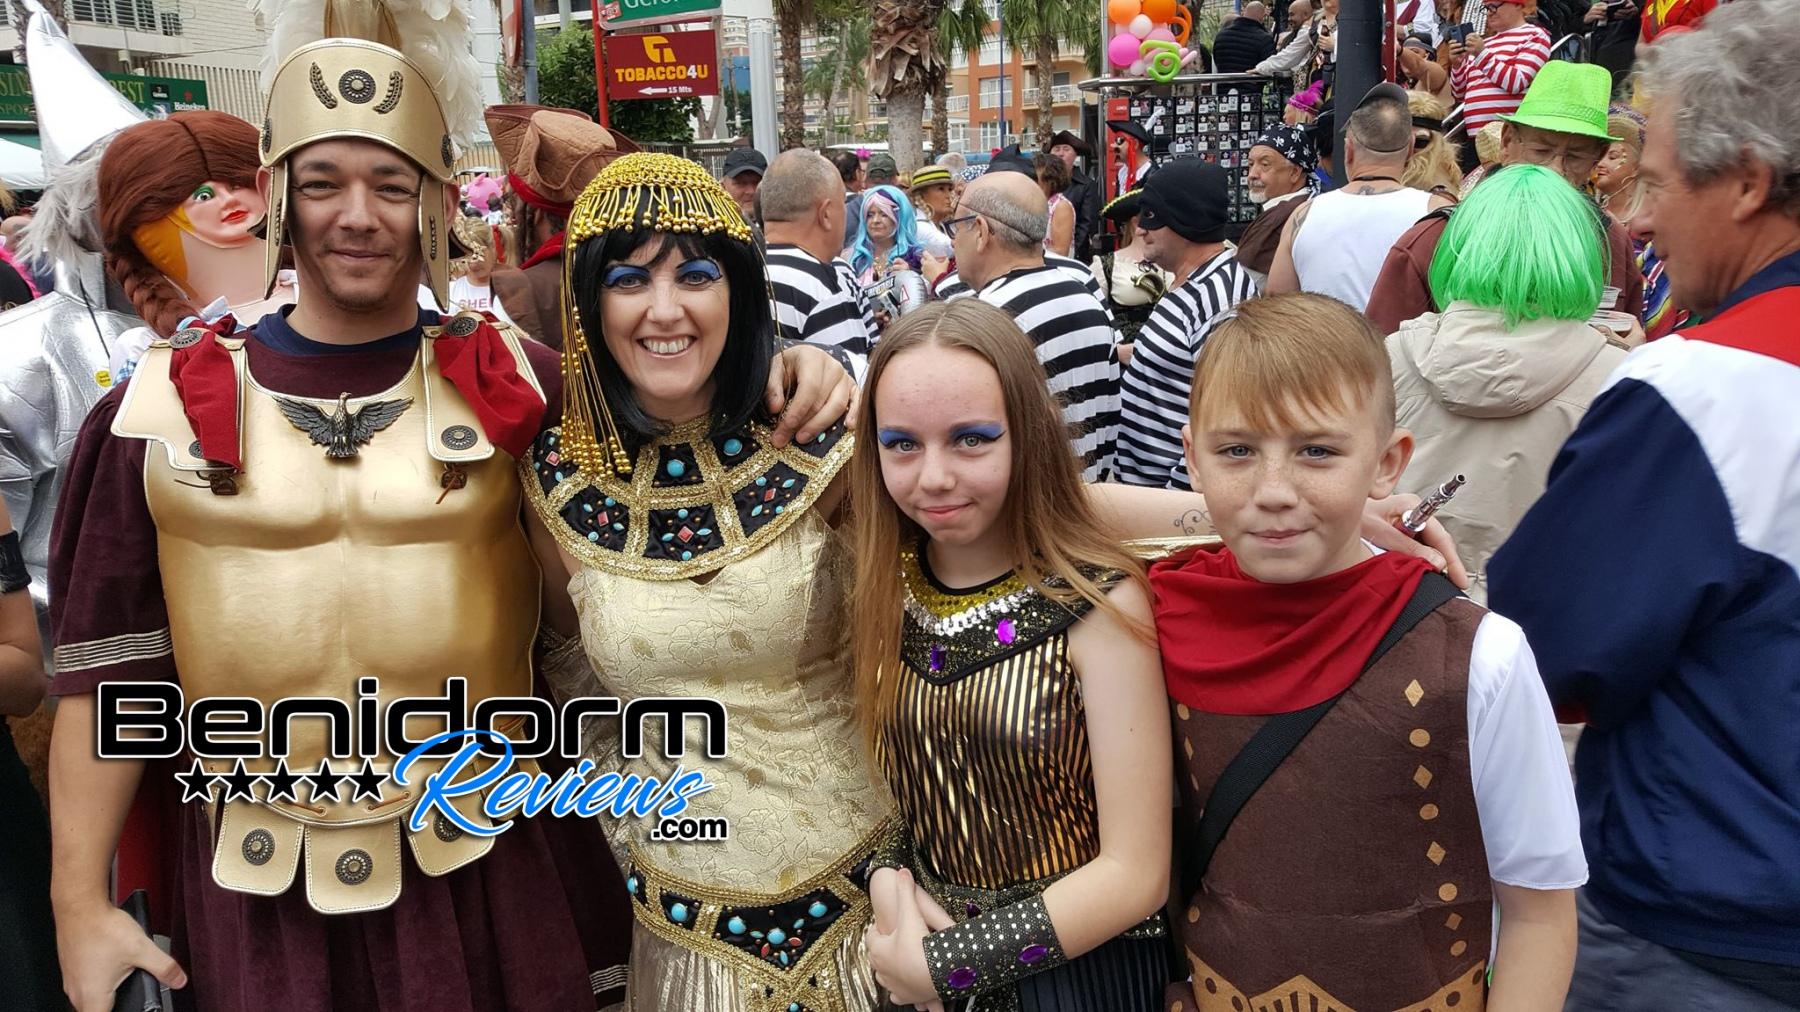 Benidorm-Fiestas-2019-Fancy-Dress-152